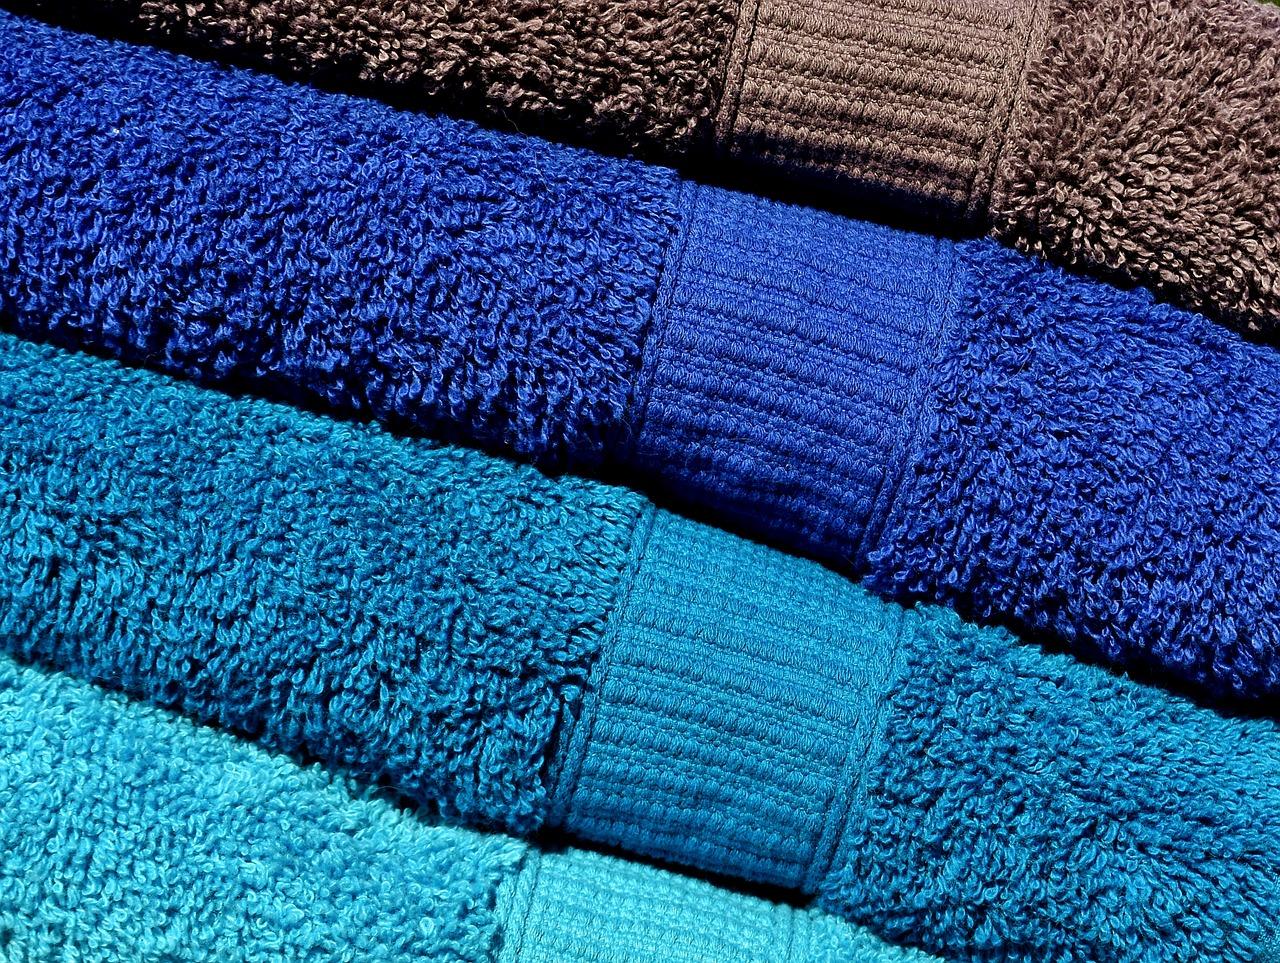 Handtücher Waschen Trocknen Bad Badezimmer Heizung